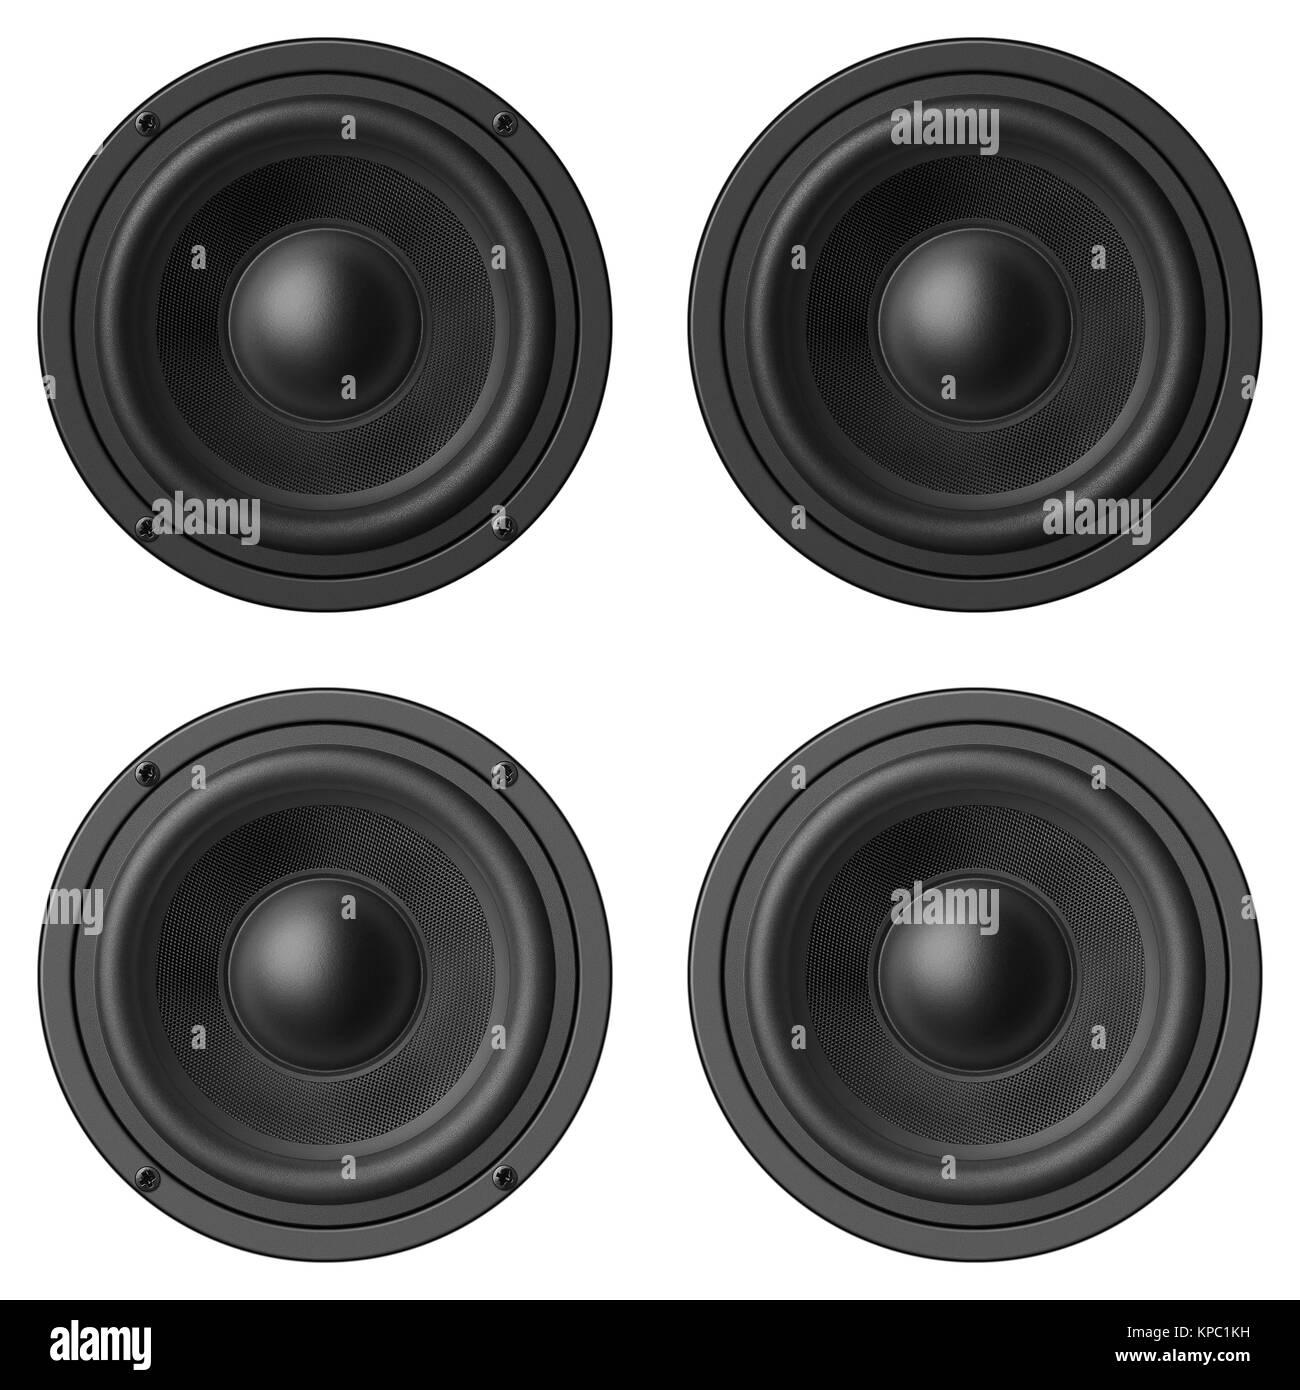 Stereo music audio equipment bass sound speaker - Stock Image